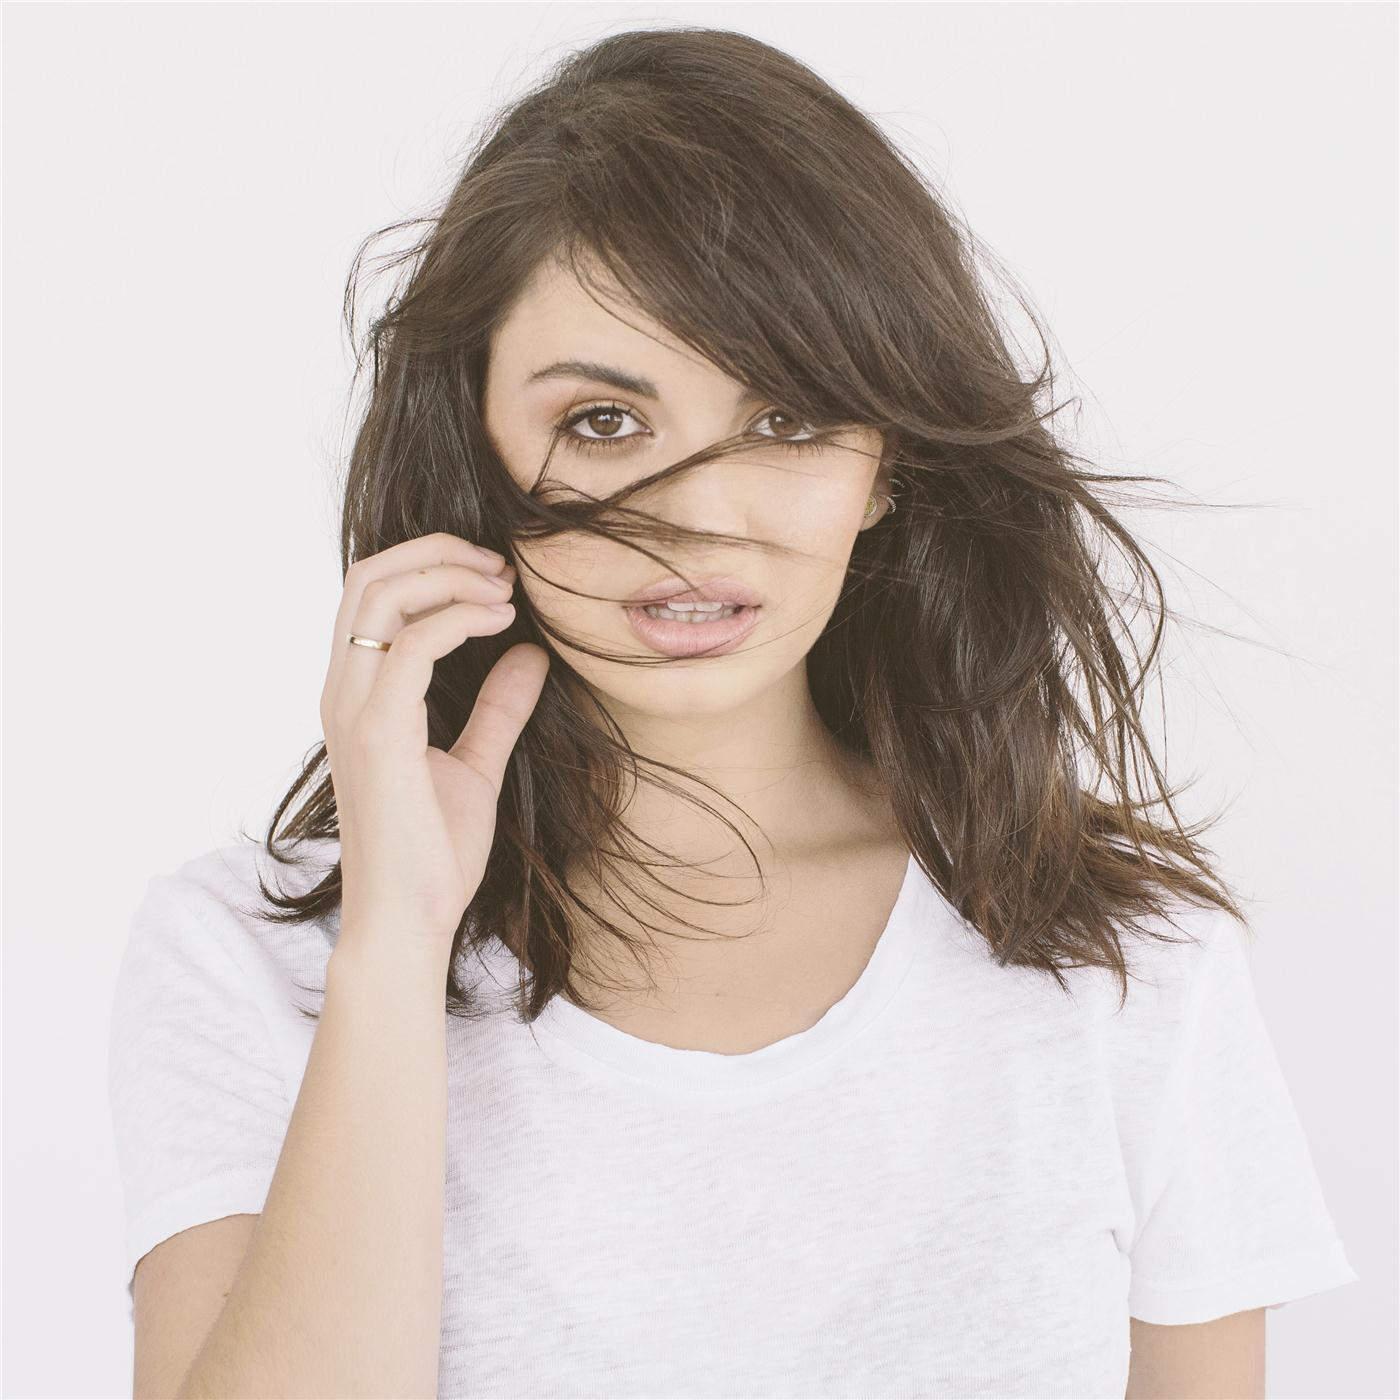 Rebecca Black - The Great Divide - Single Cover